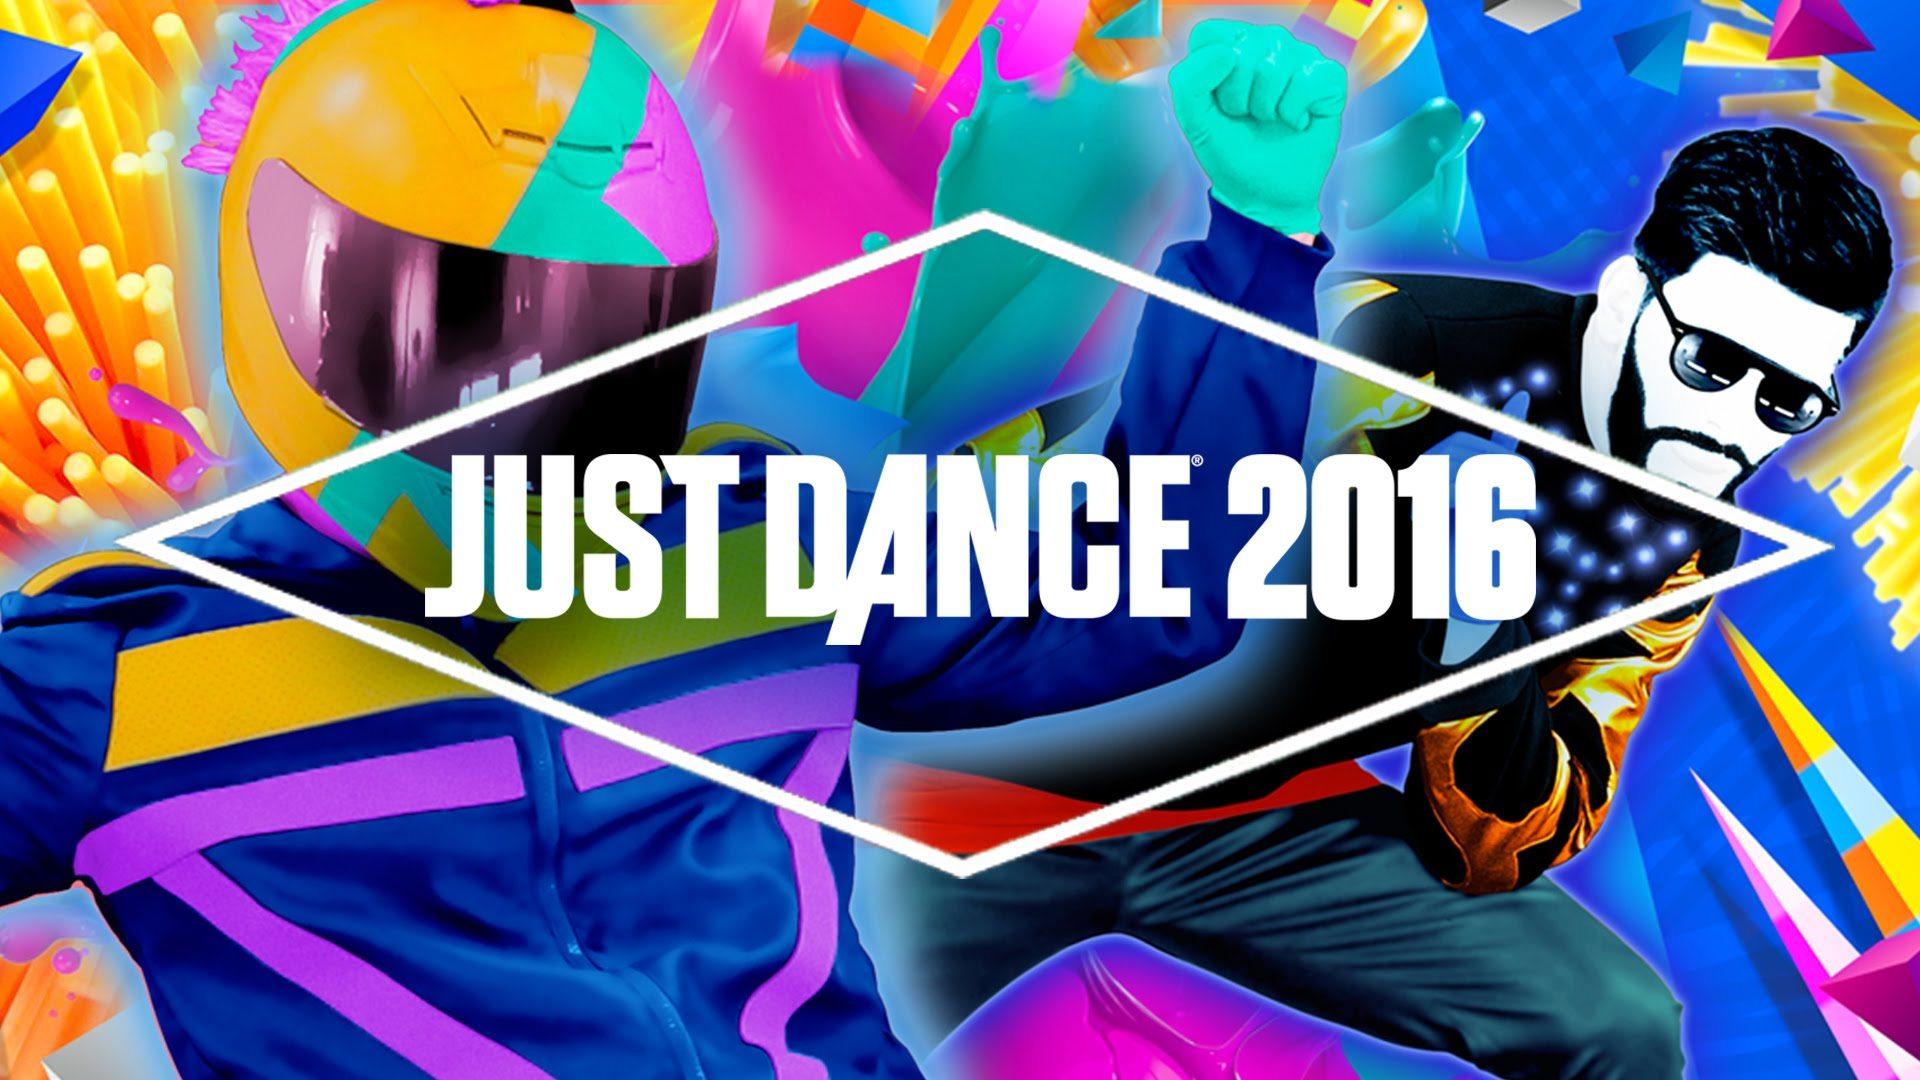 review 39 just dance 2016 39 and 39 just dance disney dance. Black Bedroom Furniture Sets. Home Design Ideas